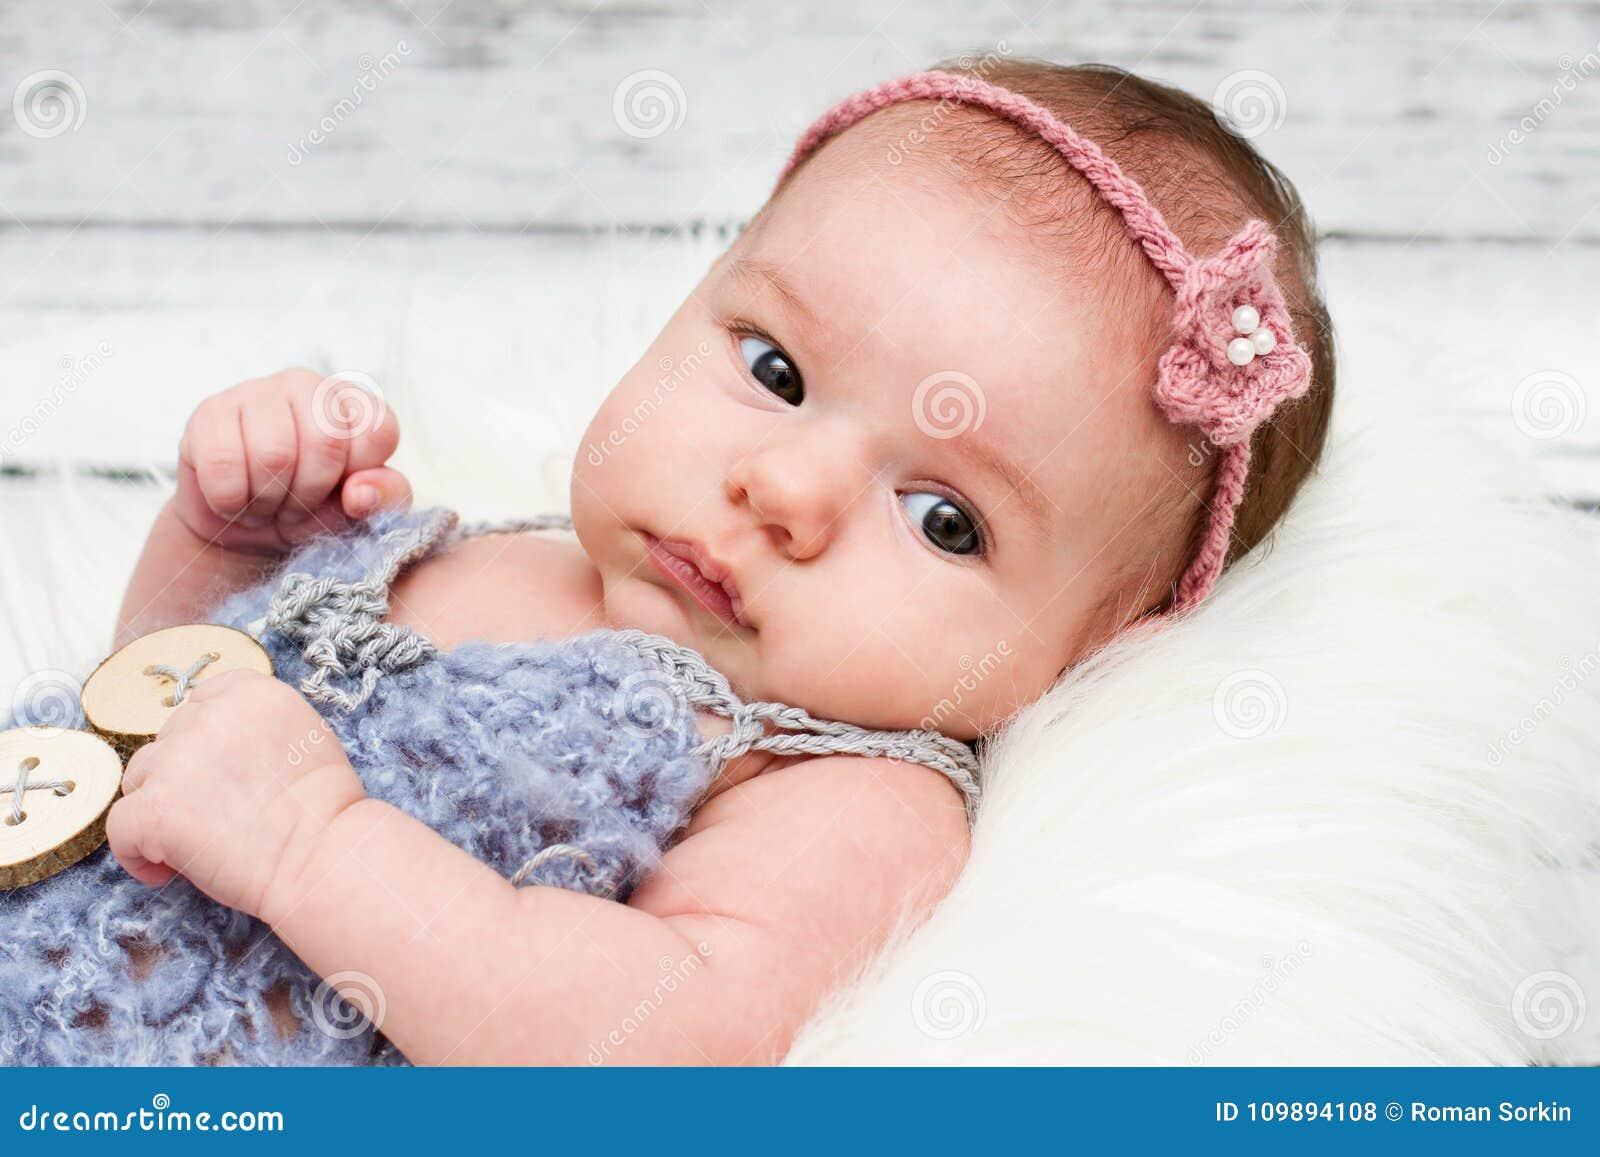 Adorable newborn baby girl looking towards camera